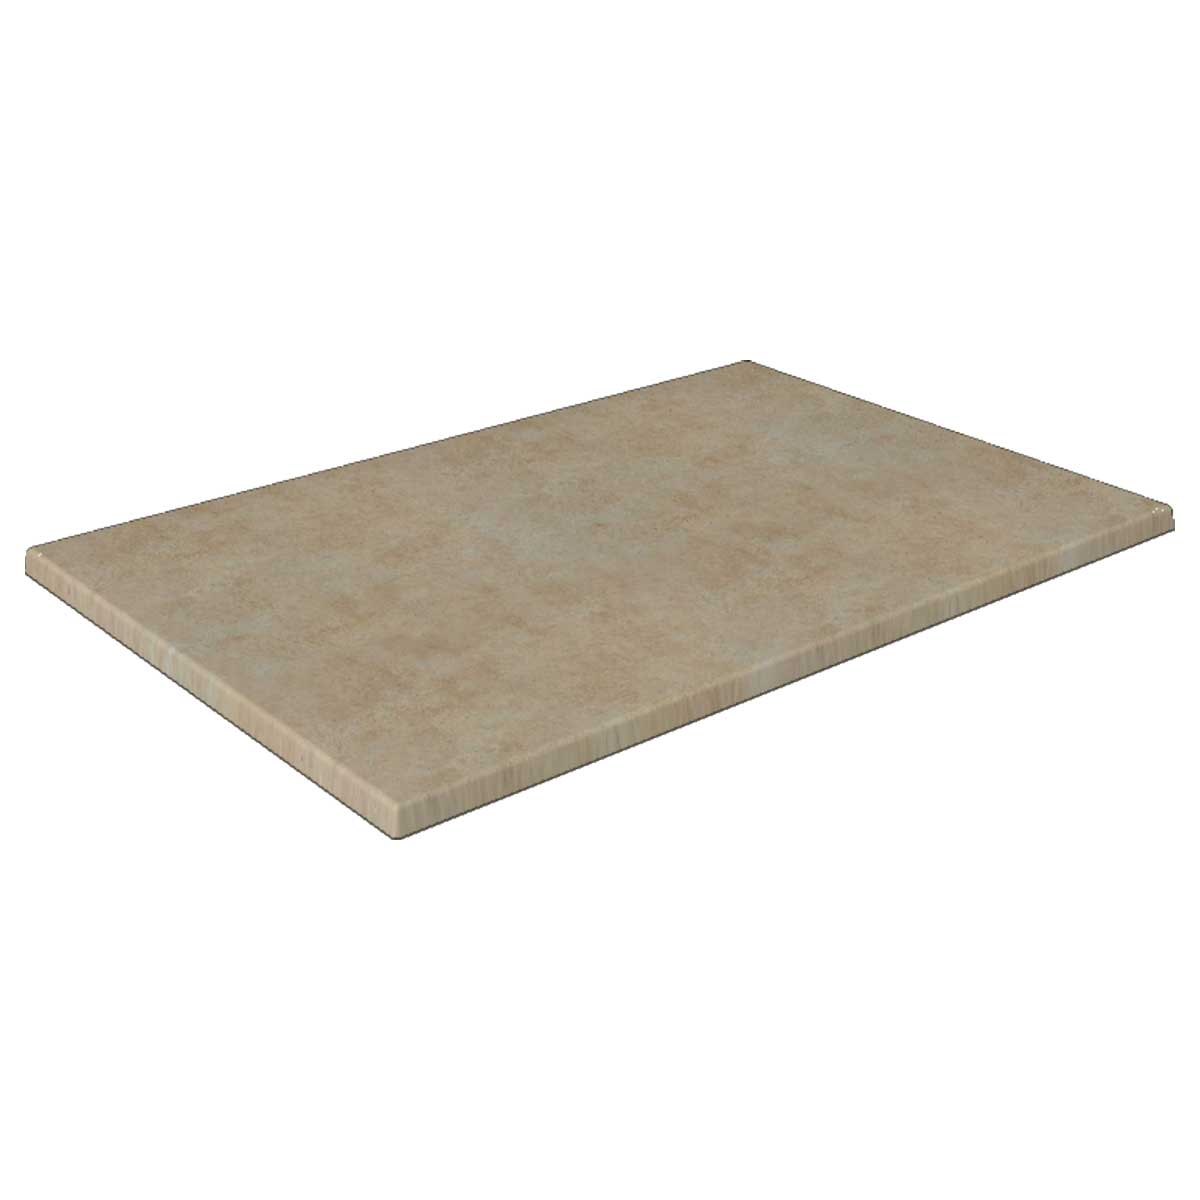 TICLA E120X80 306 - https://www.werzalit.com/fr/produit/plateau-de-table-classic-werzalit-e-110x70-306-catalan/